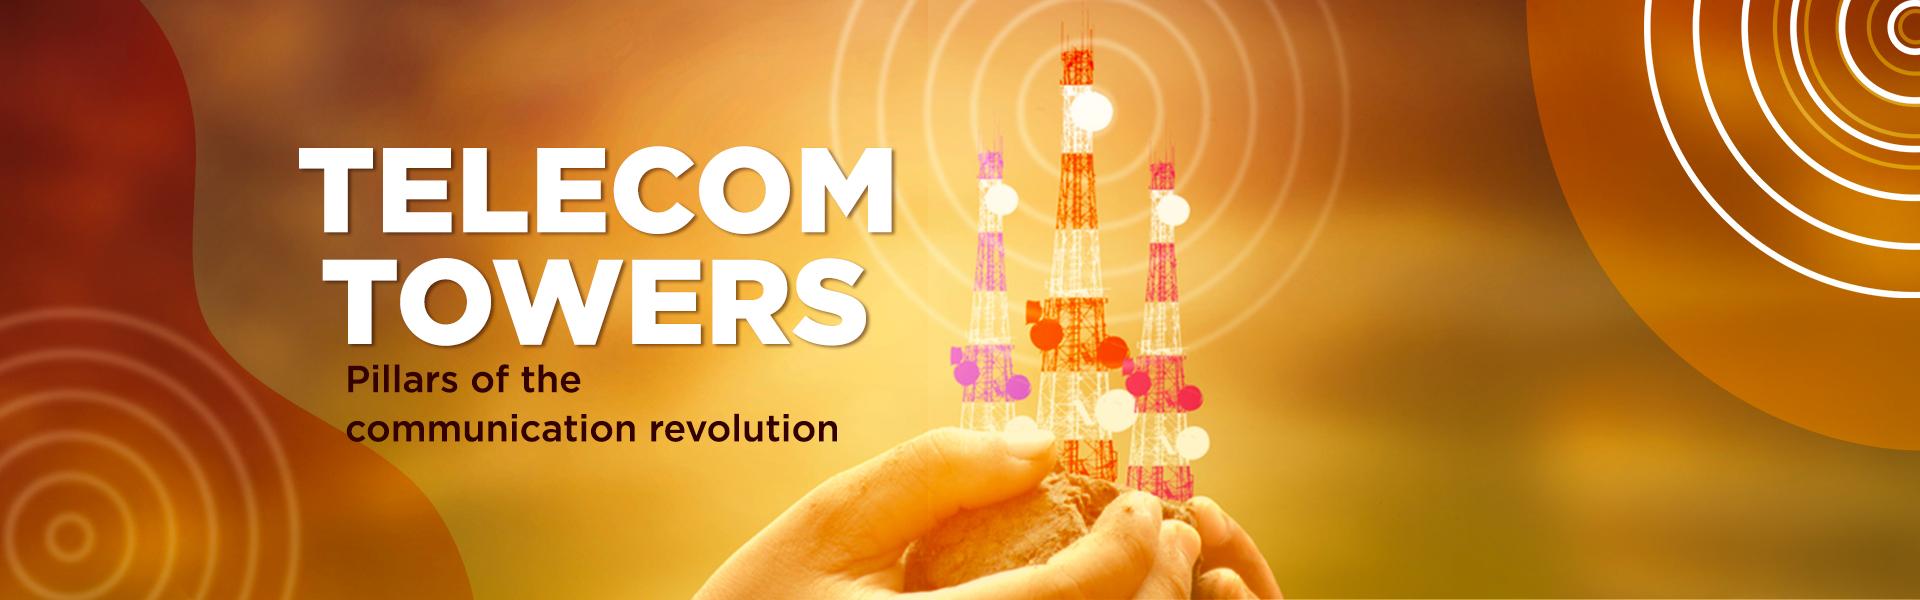 Telecom Towers-Pillars of the communication revolution